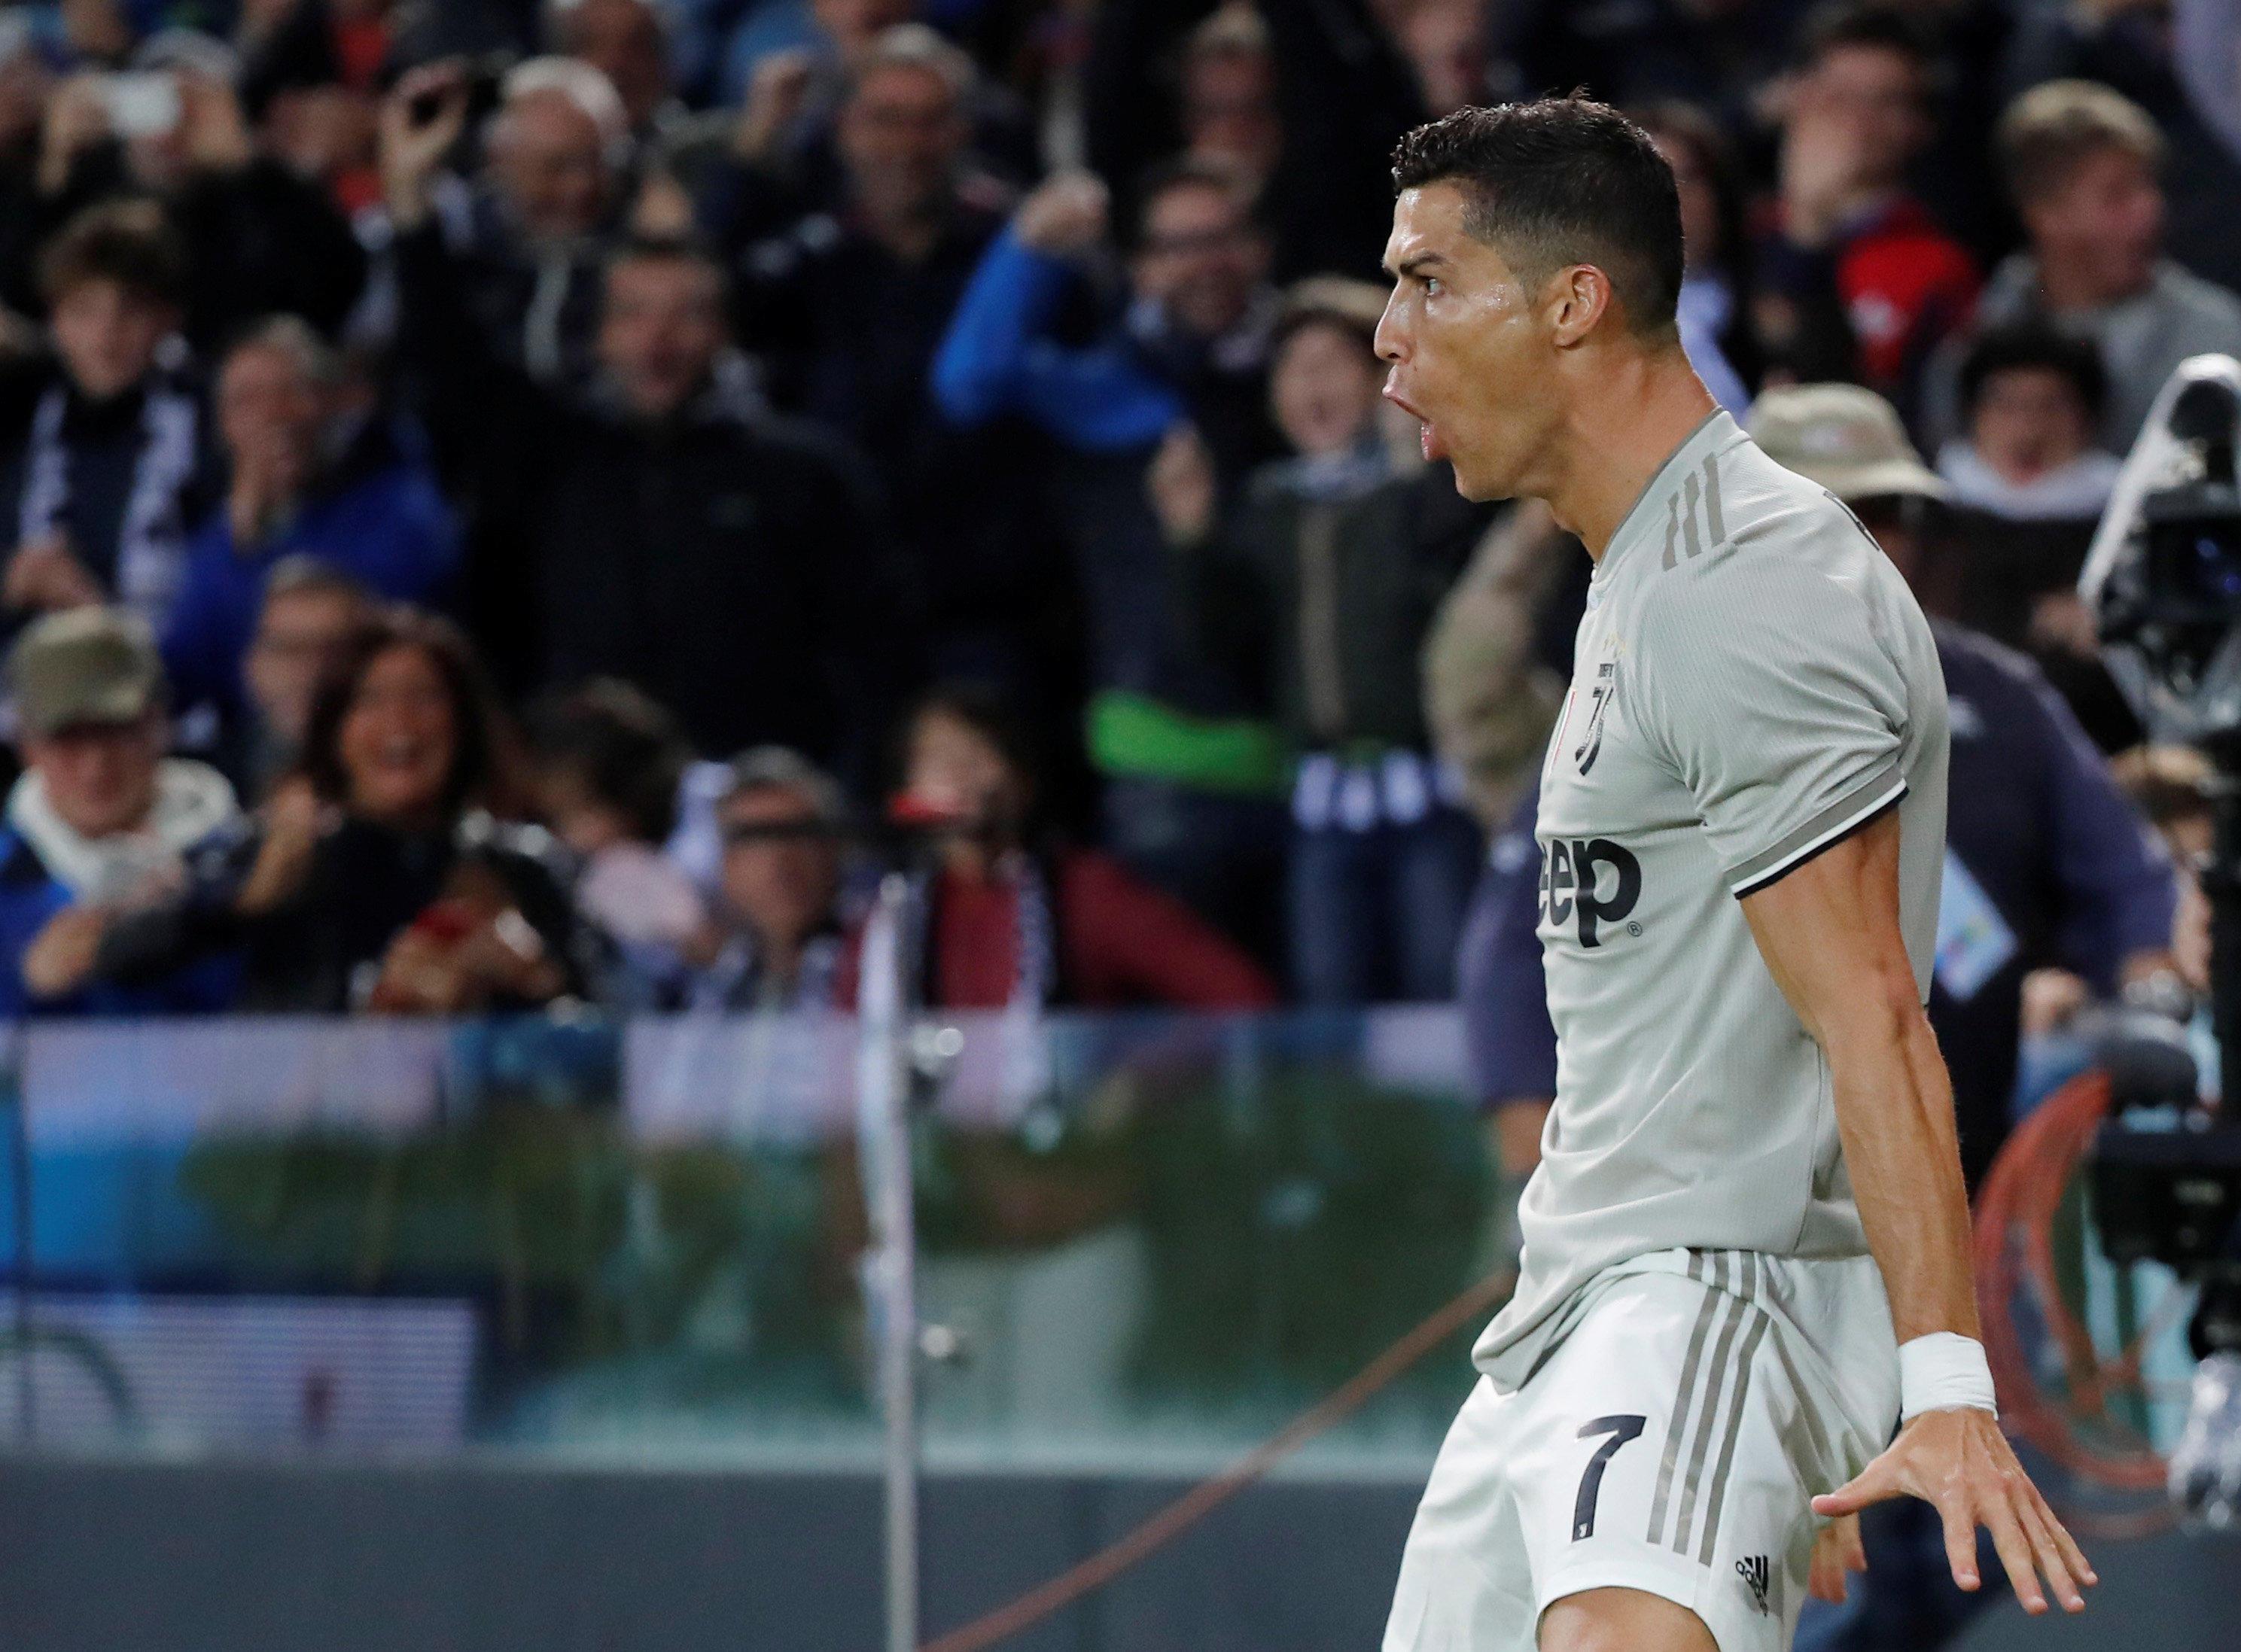 97d2a72fbce Cristiano Ronaldo scores for Juventus amid rape allegation - CBS News